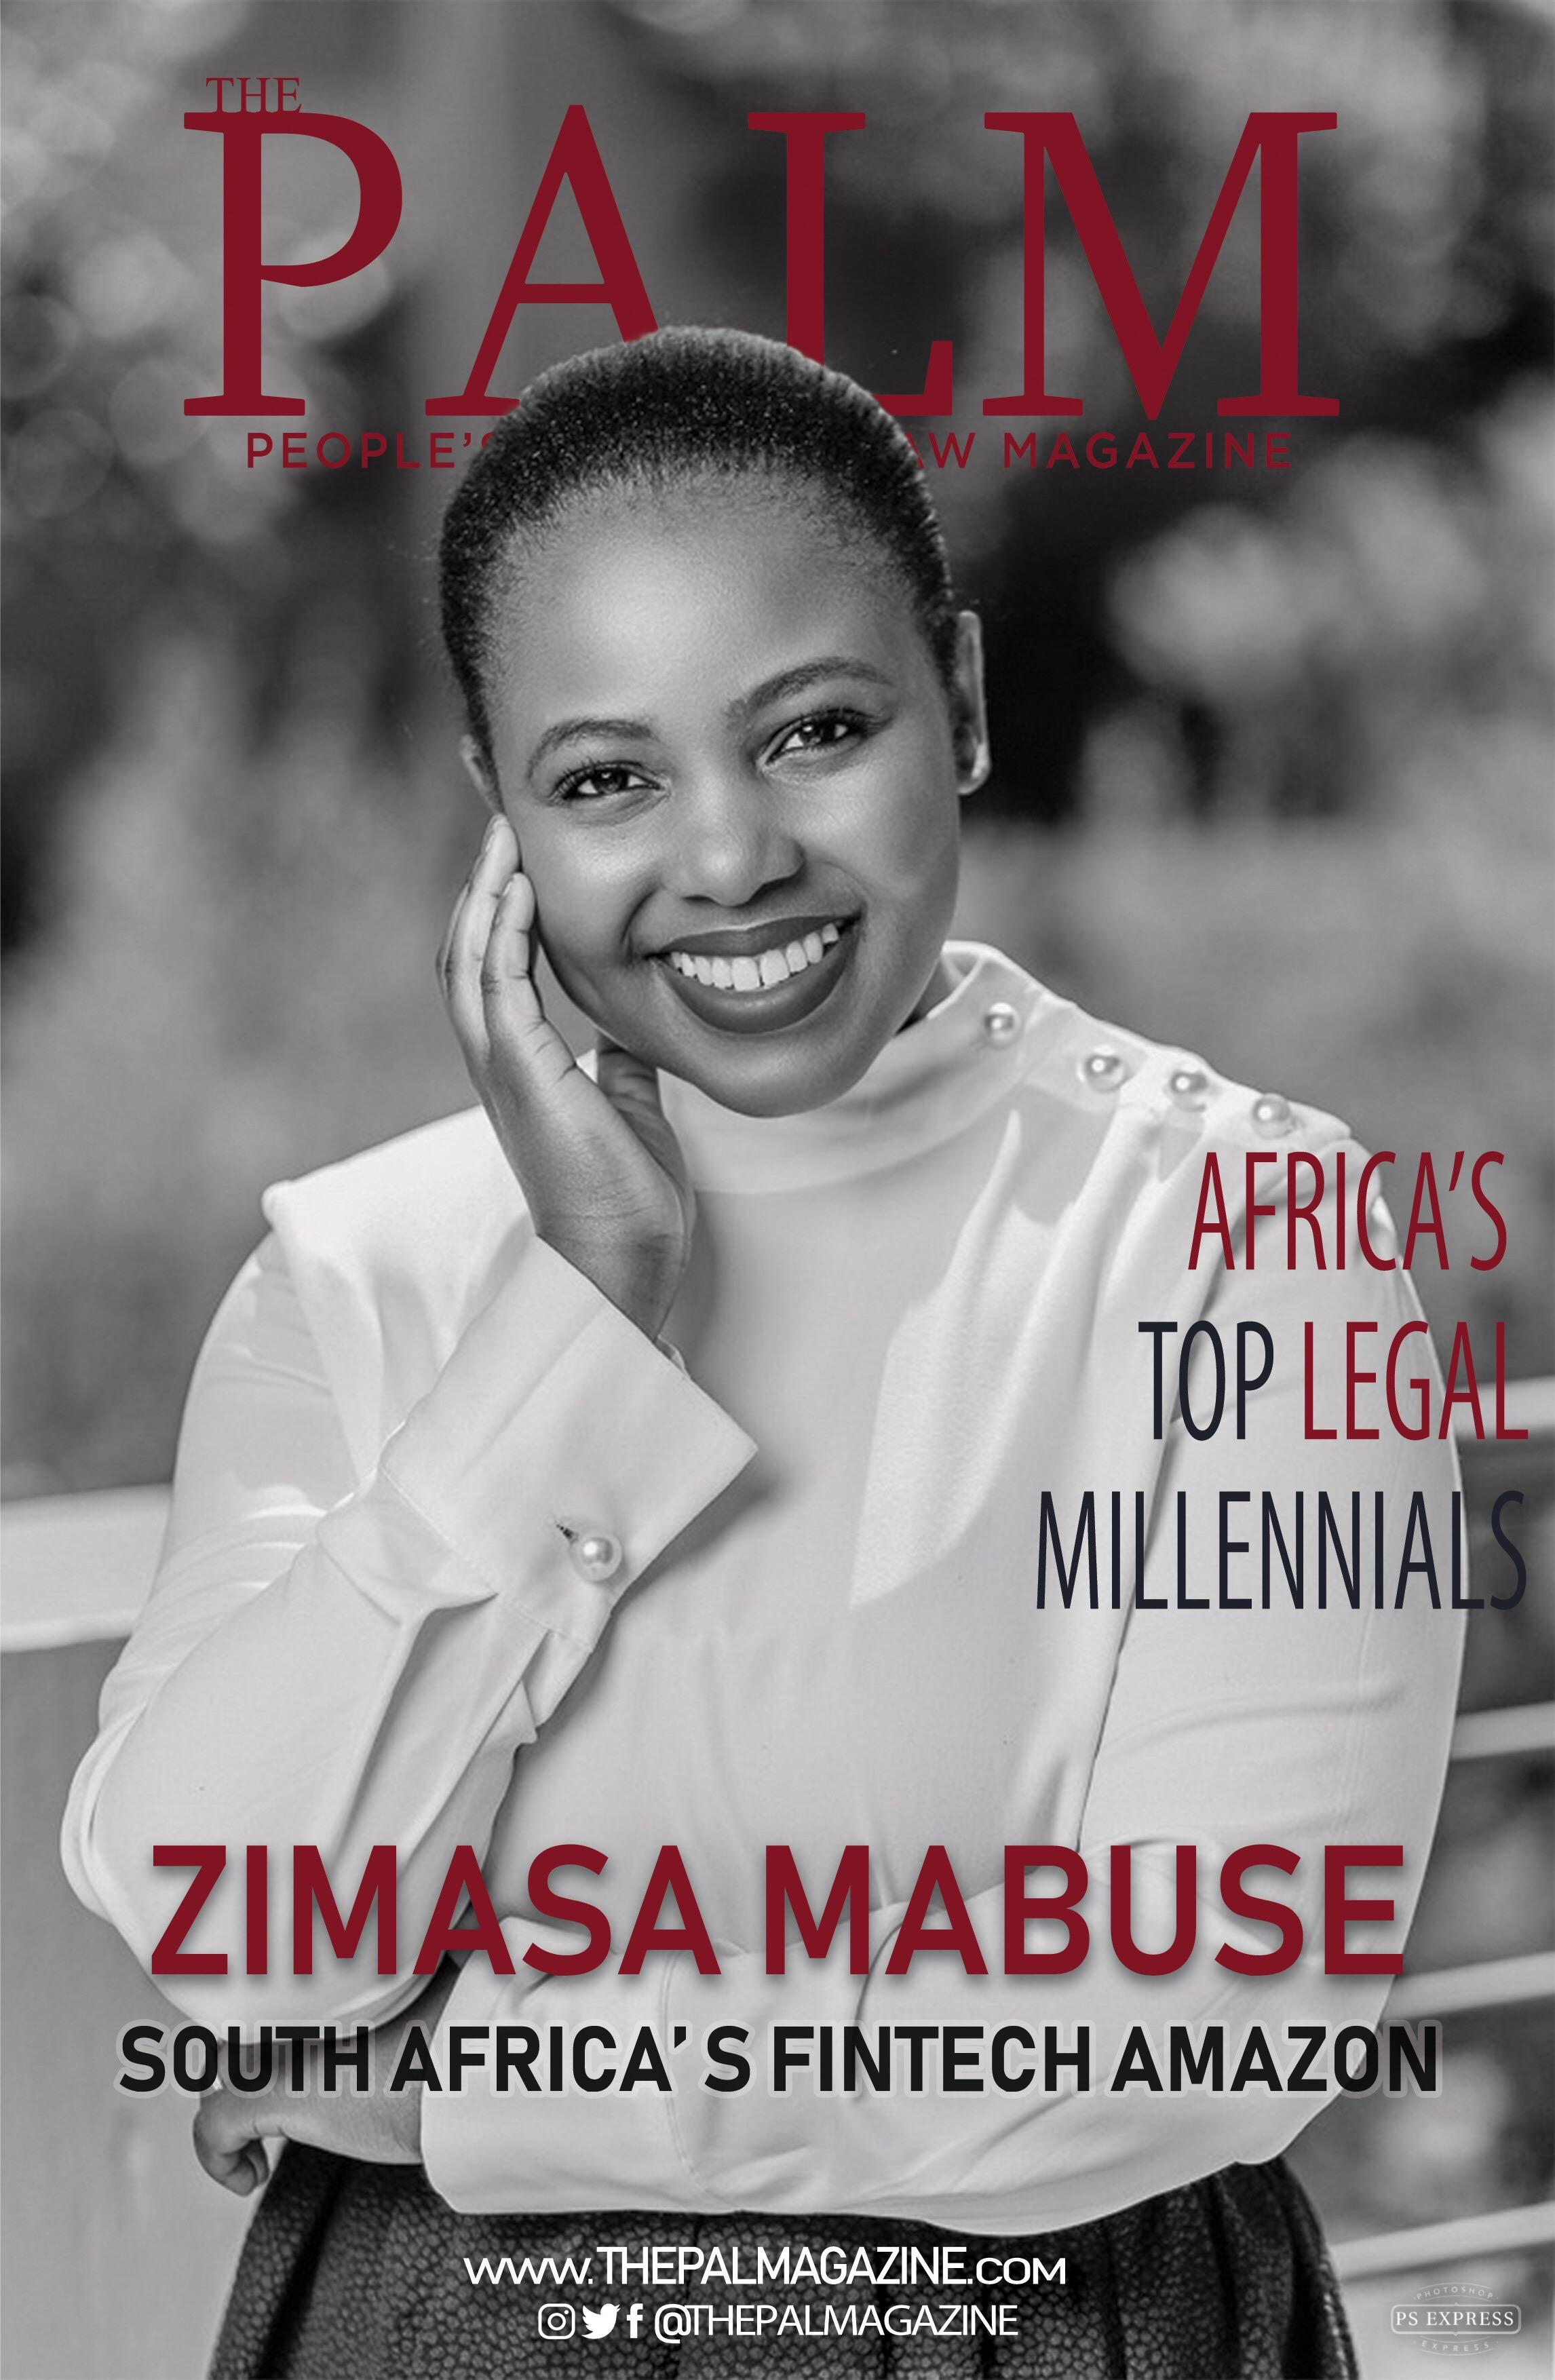 Zimasa Mabuse: The South African FinTech Amazon